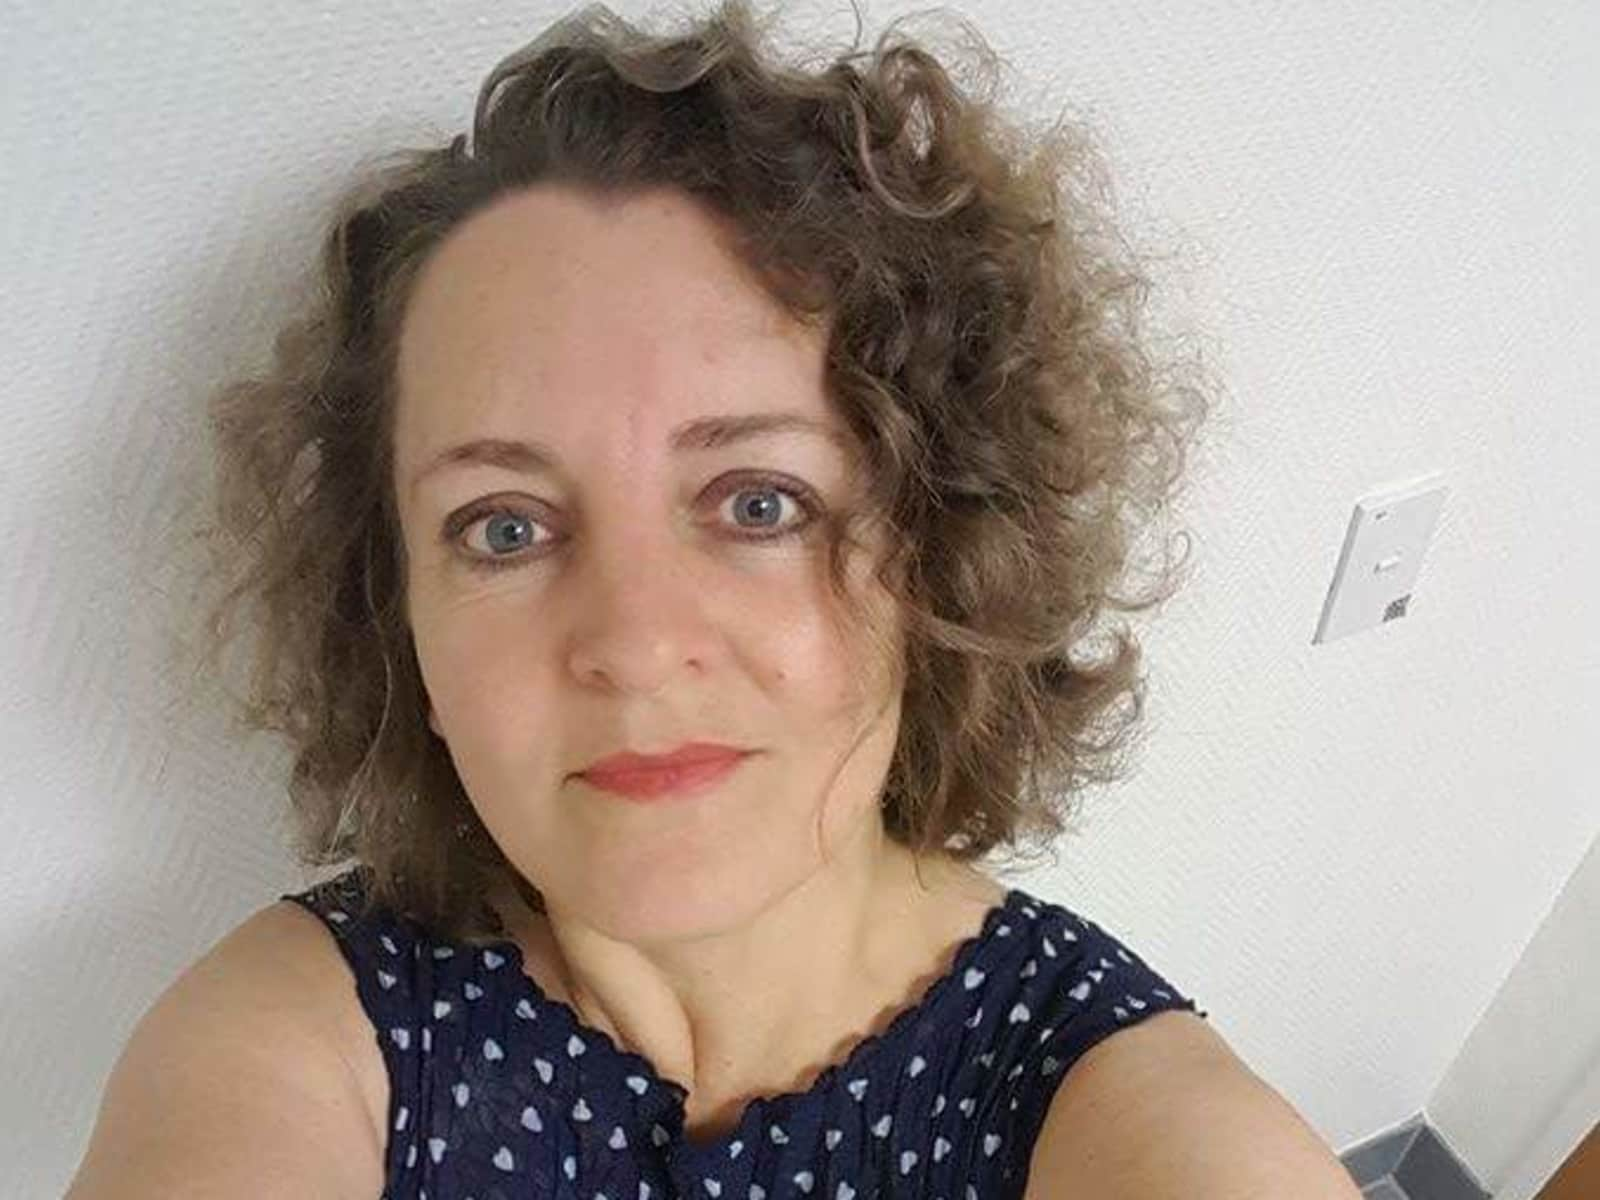 Suzanne from Maidstone, United Kingdom